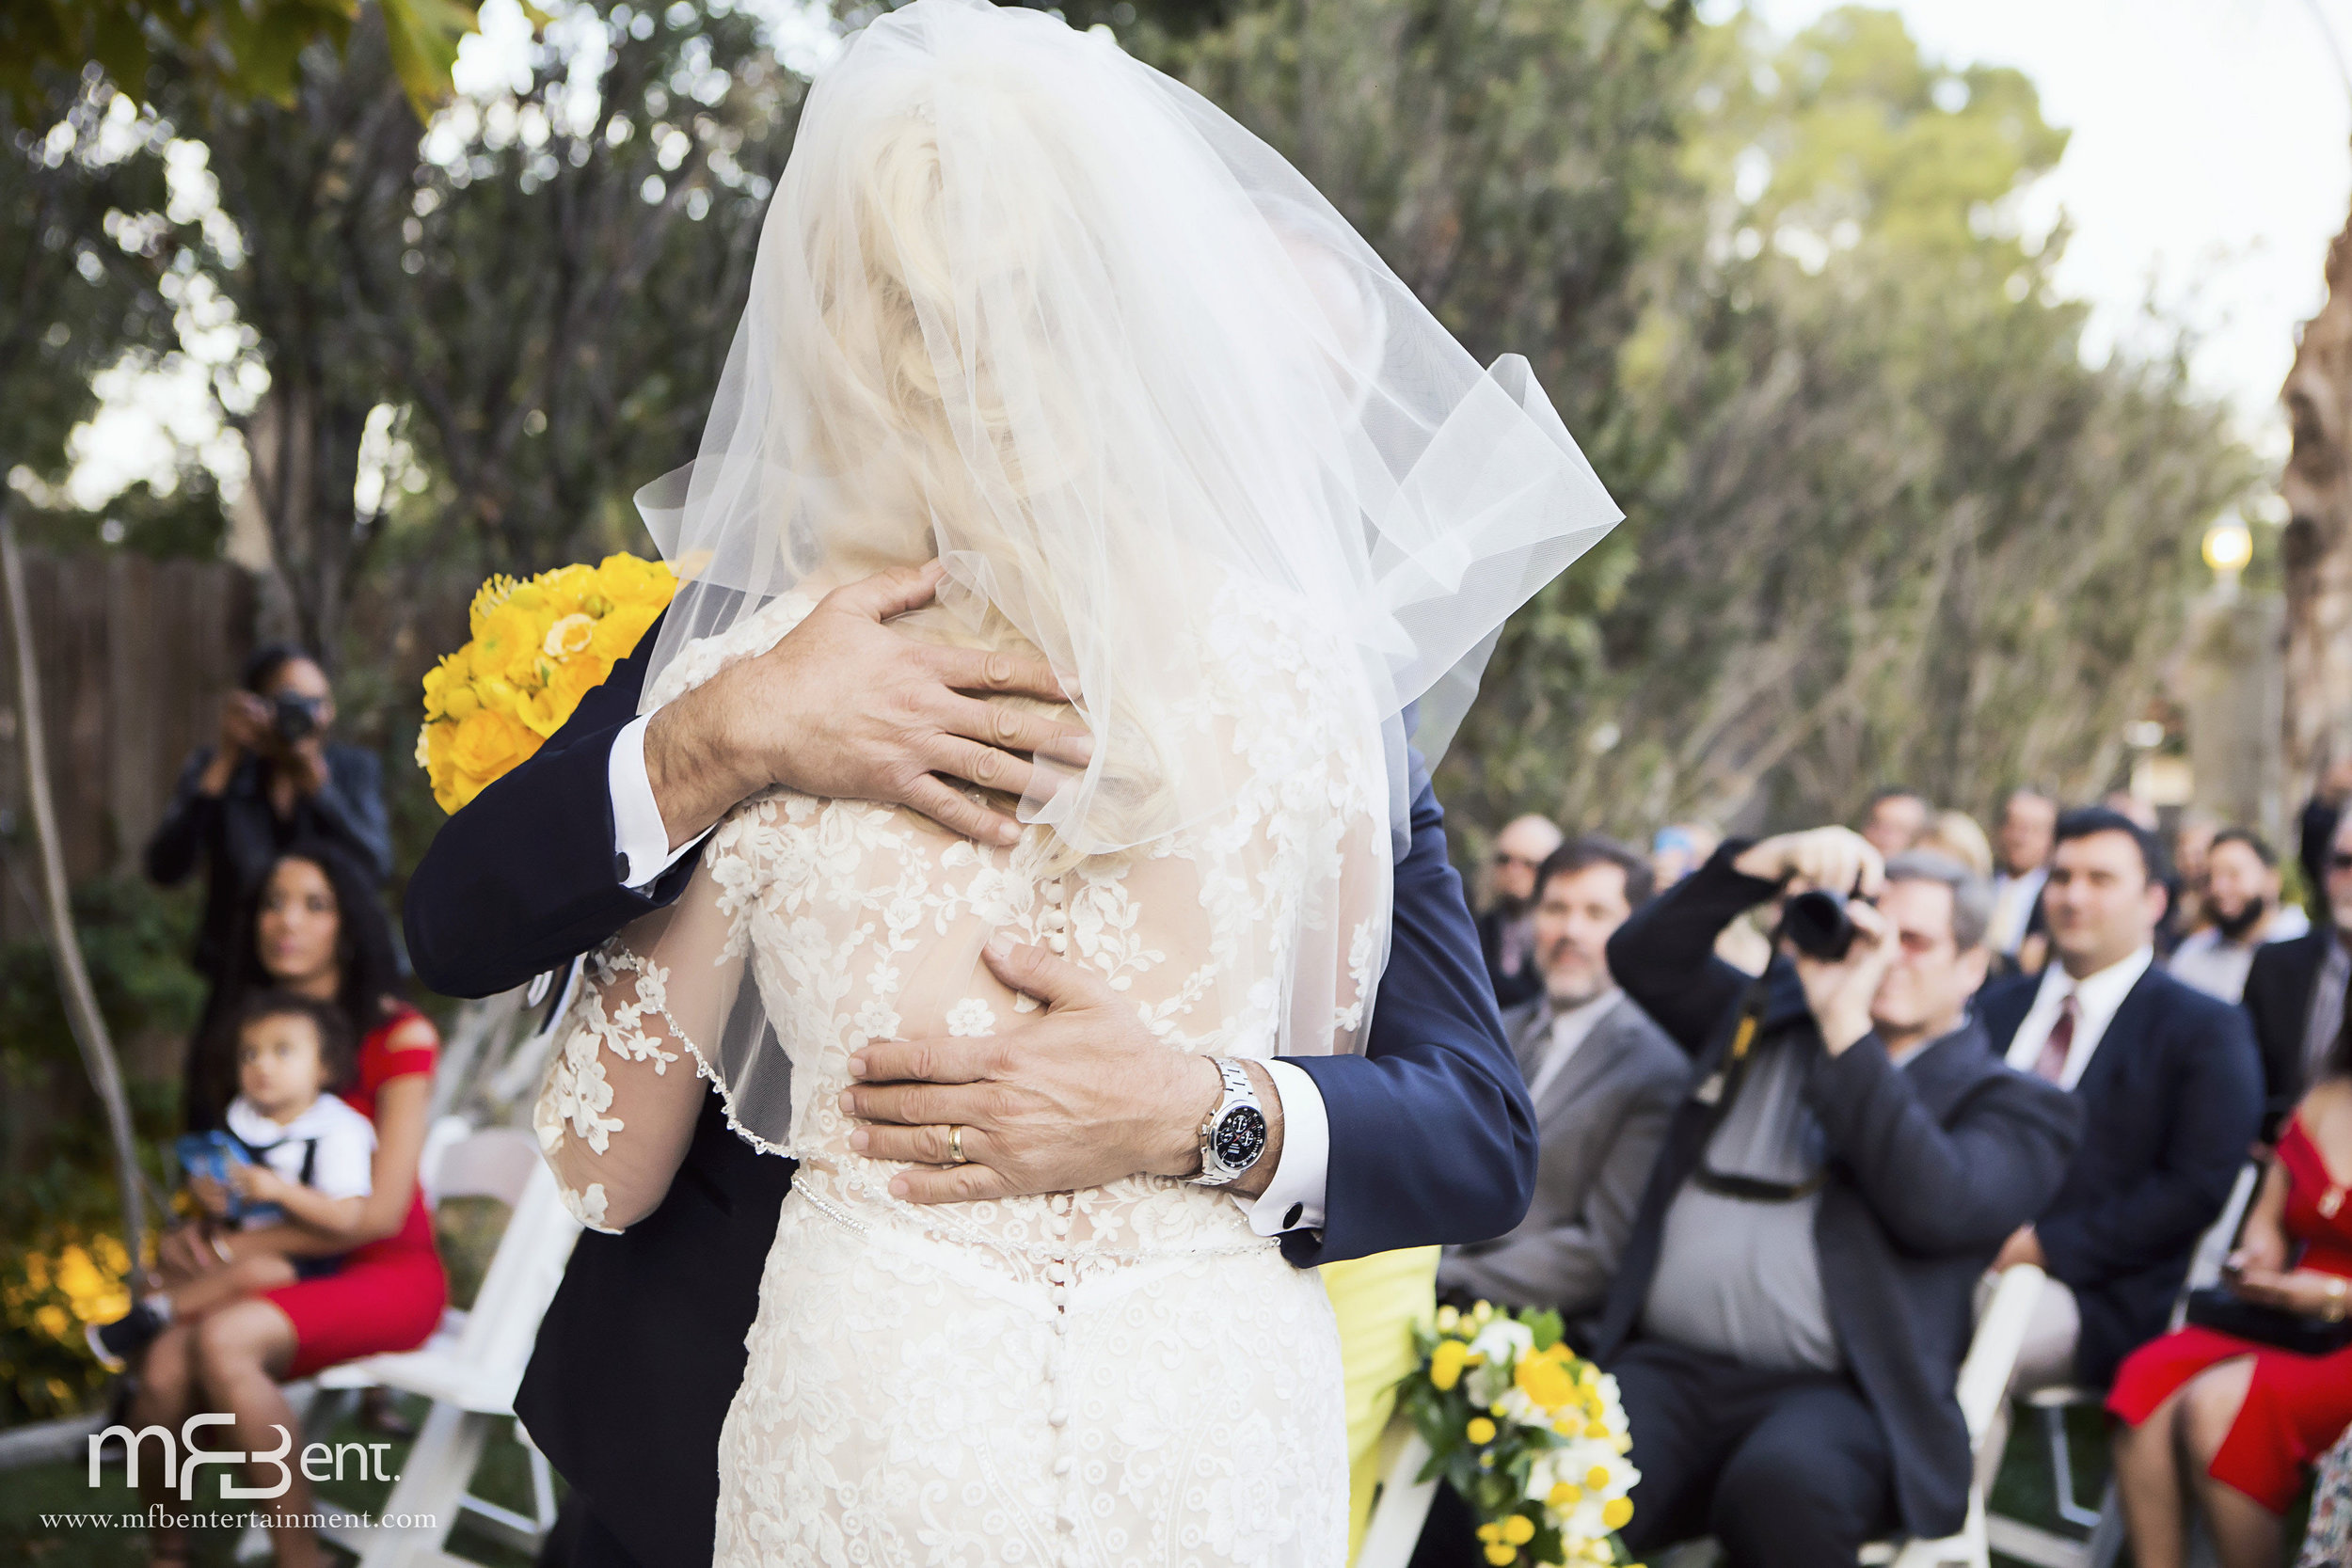 PIOTR CHELSEA WEDDING-CEREMONY-0080 L.jpg